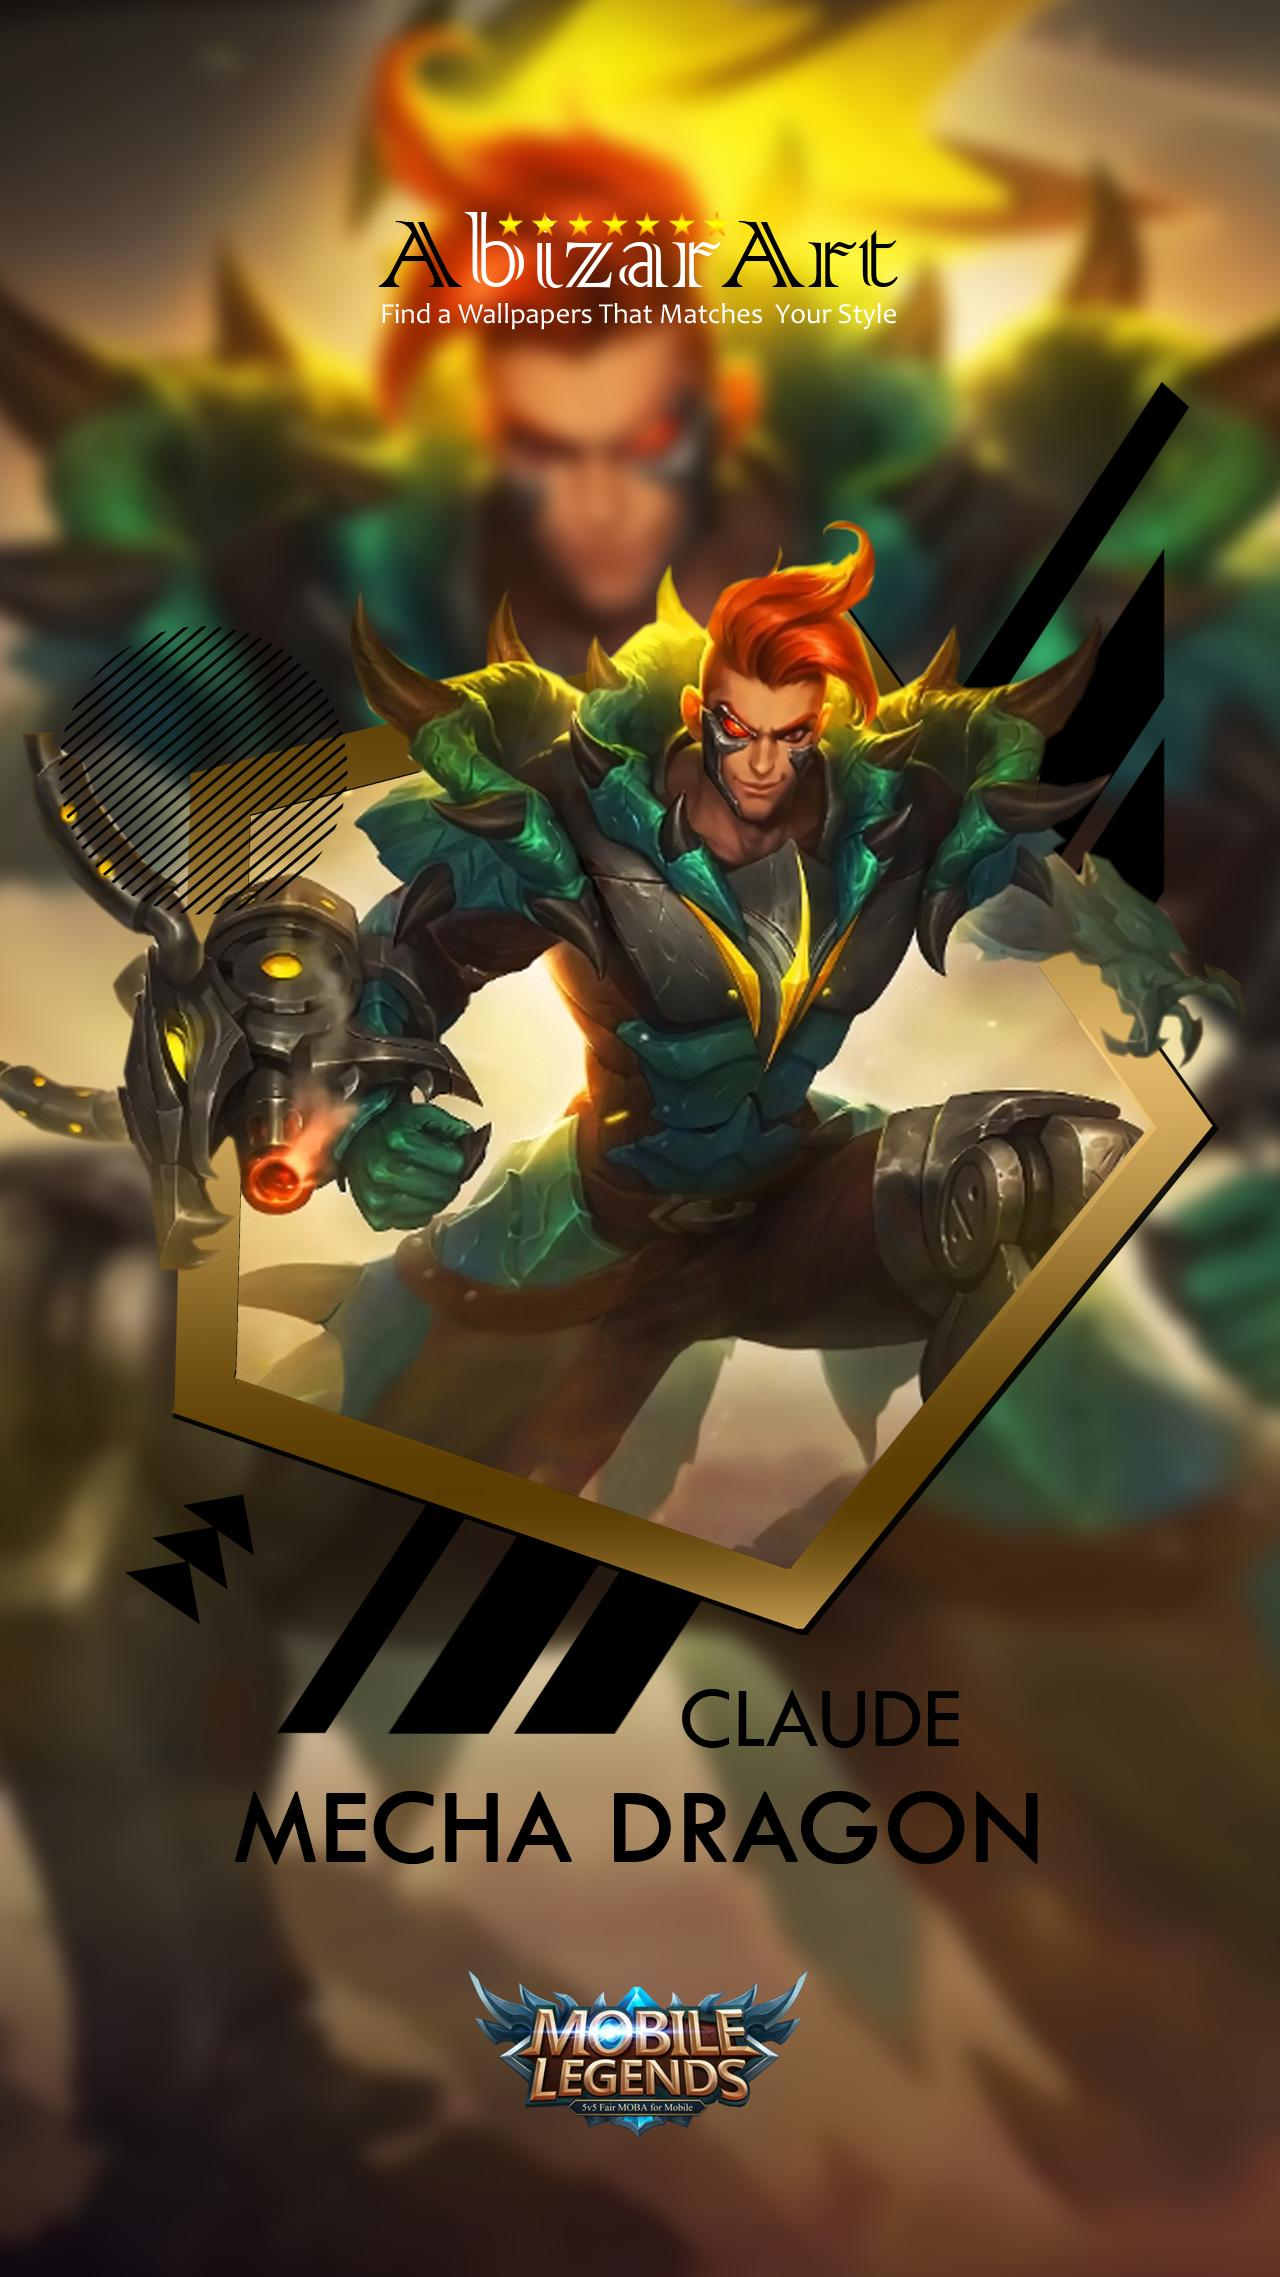 Claude Mobile Legends Wallpapers - Top Free Claude Mobile ...